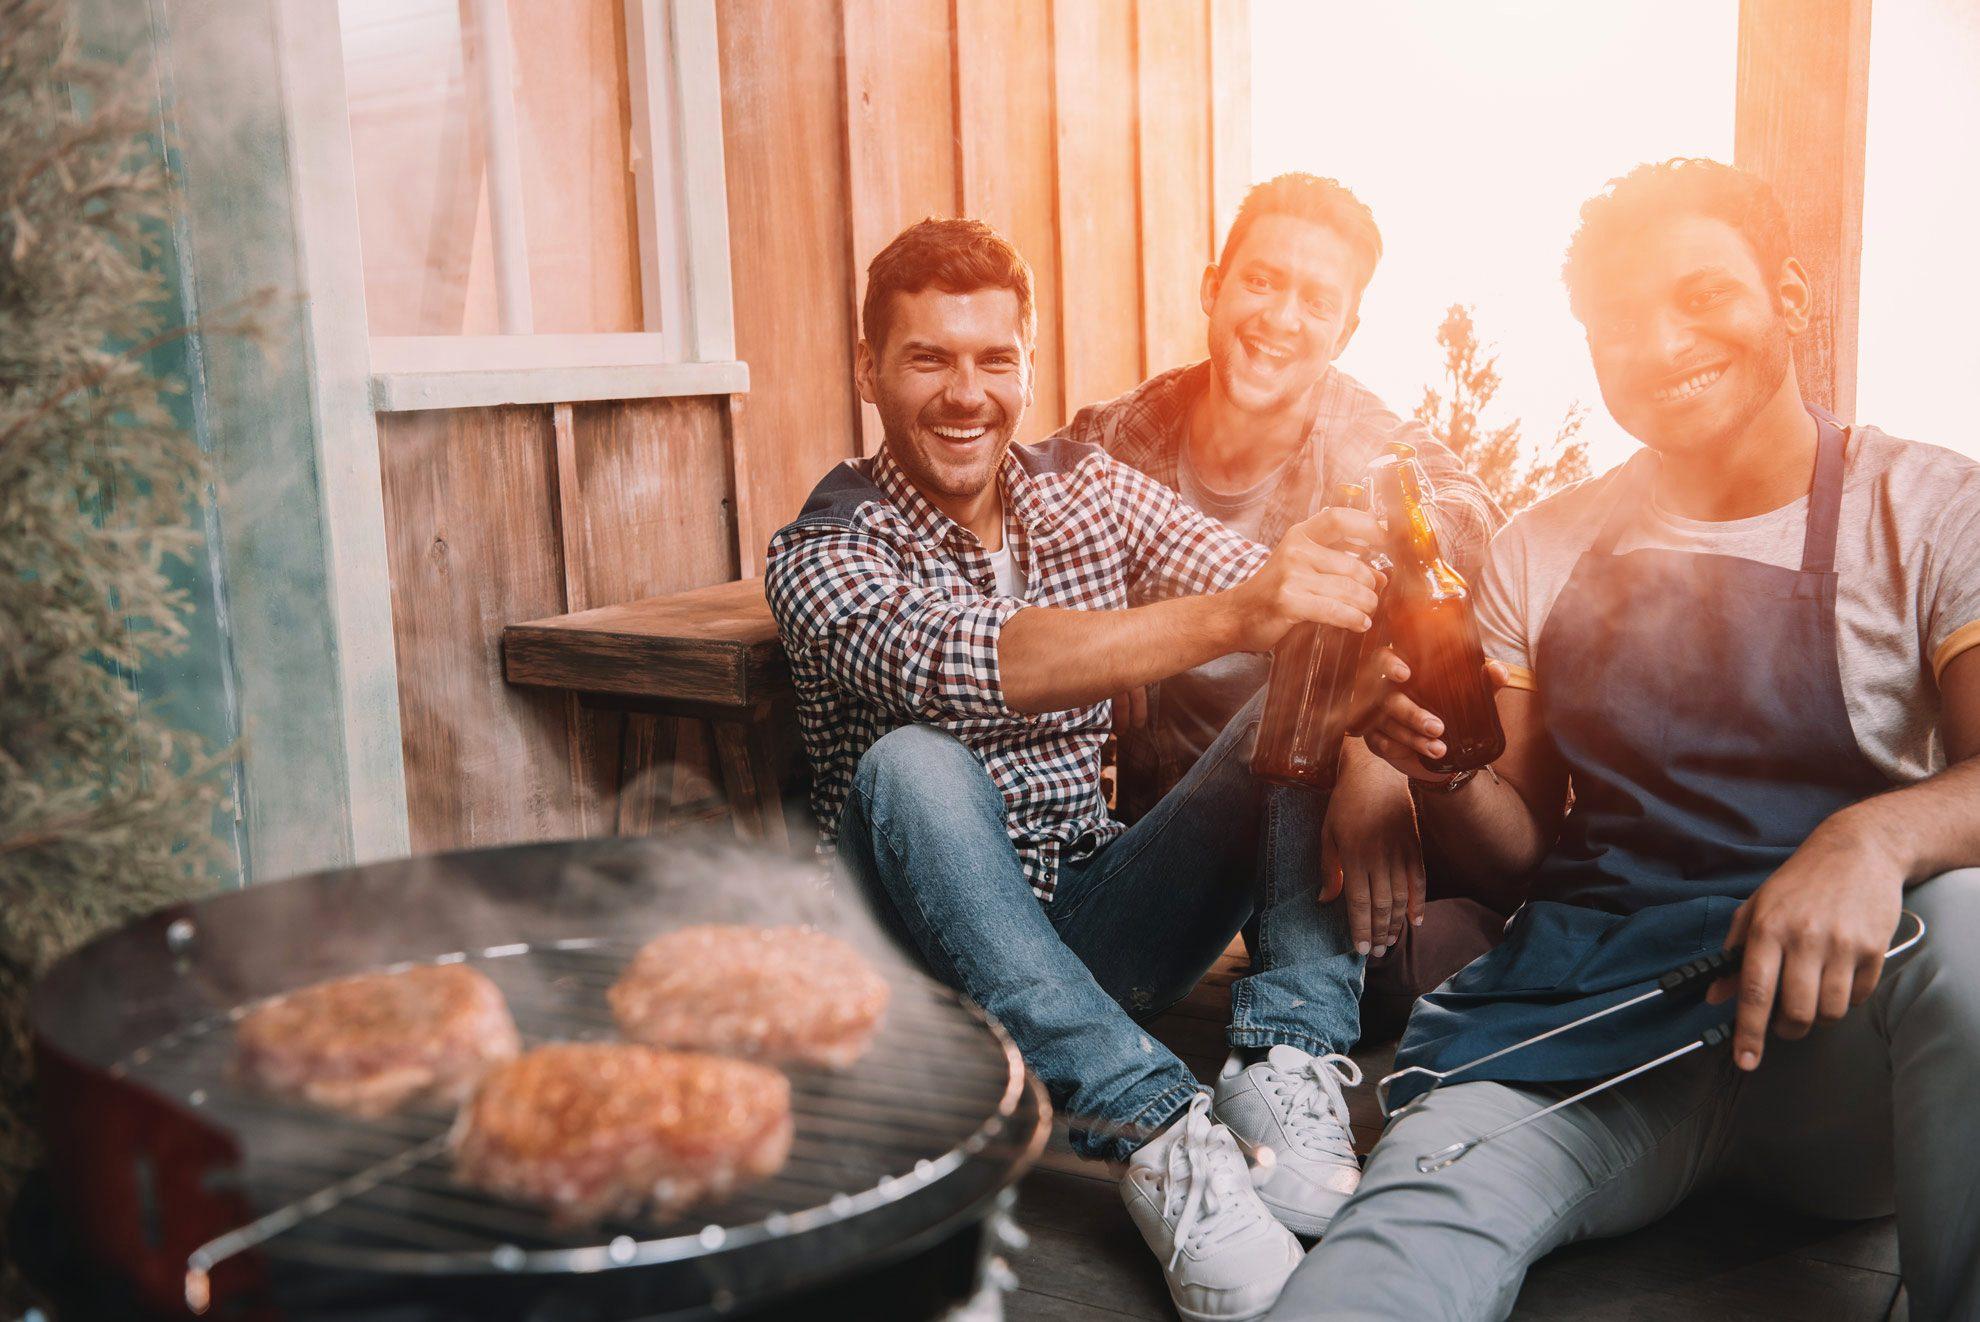 Burger grillen - Contentbild